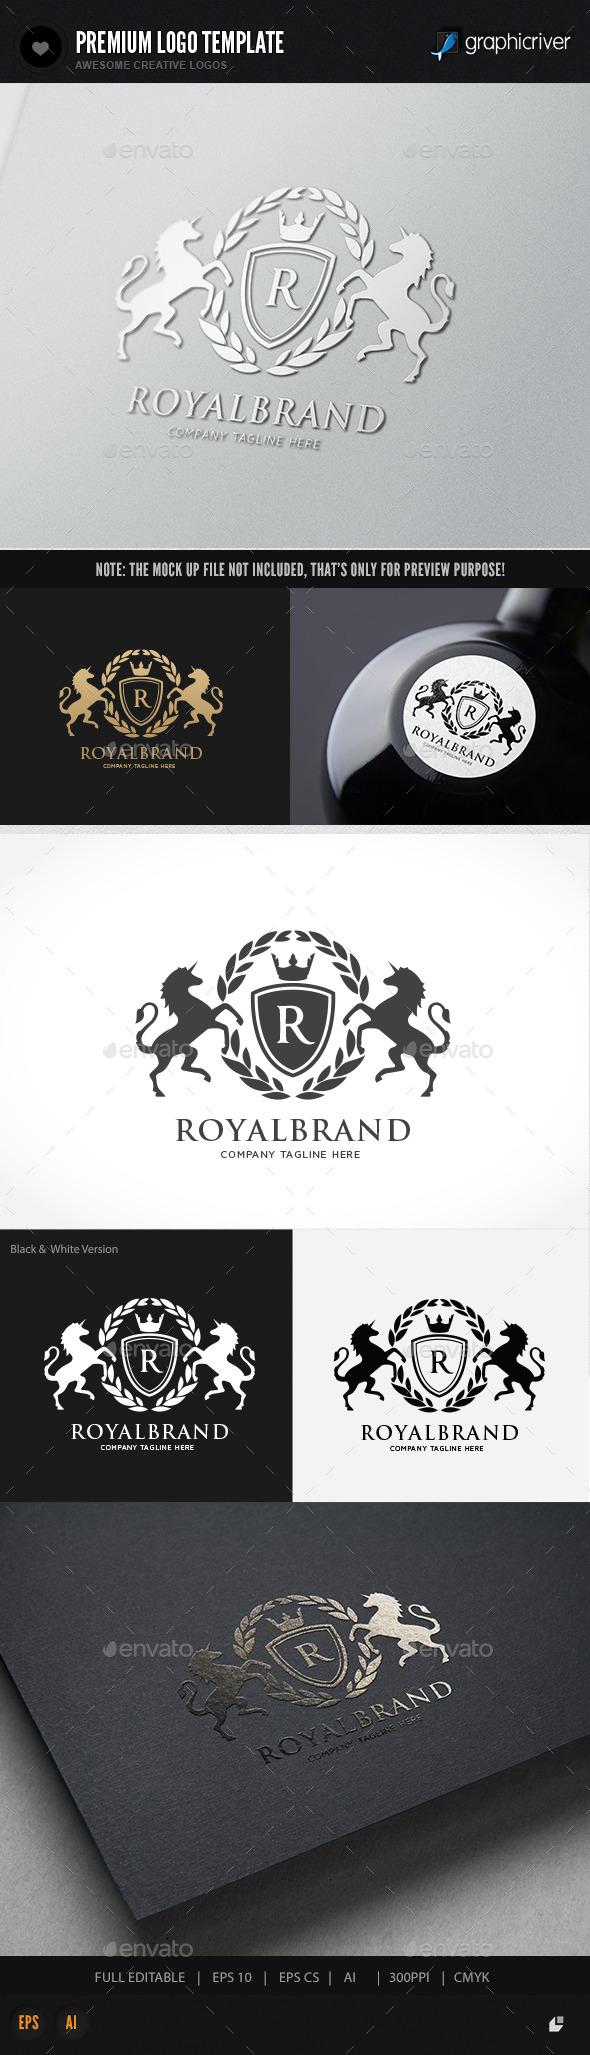 GraphicRiver Royal Brand 11936173